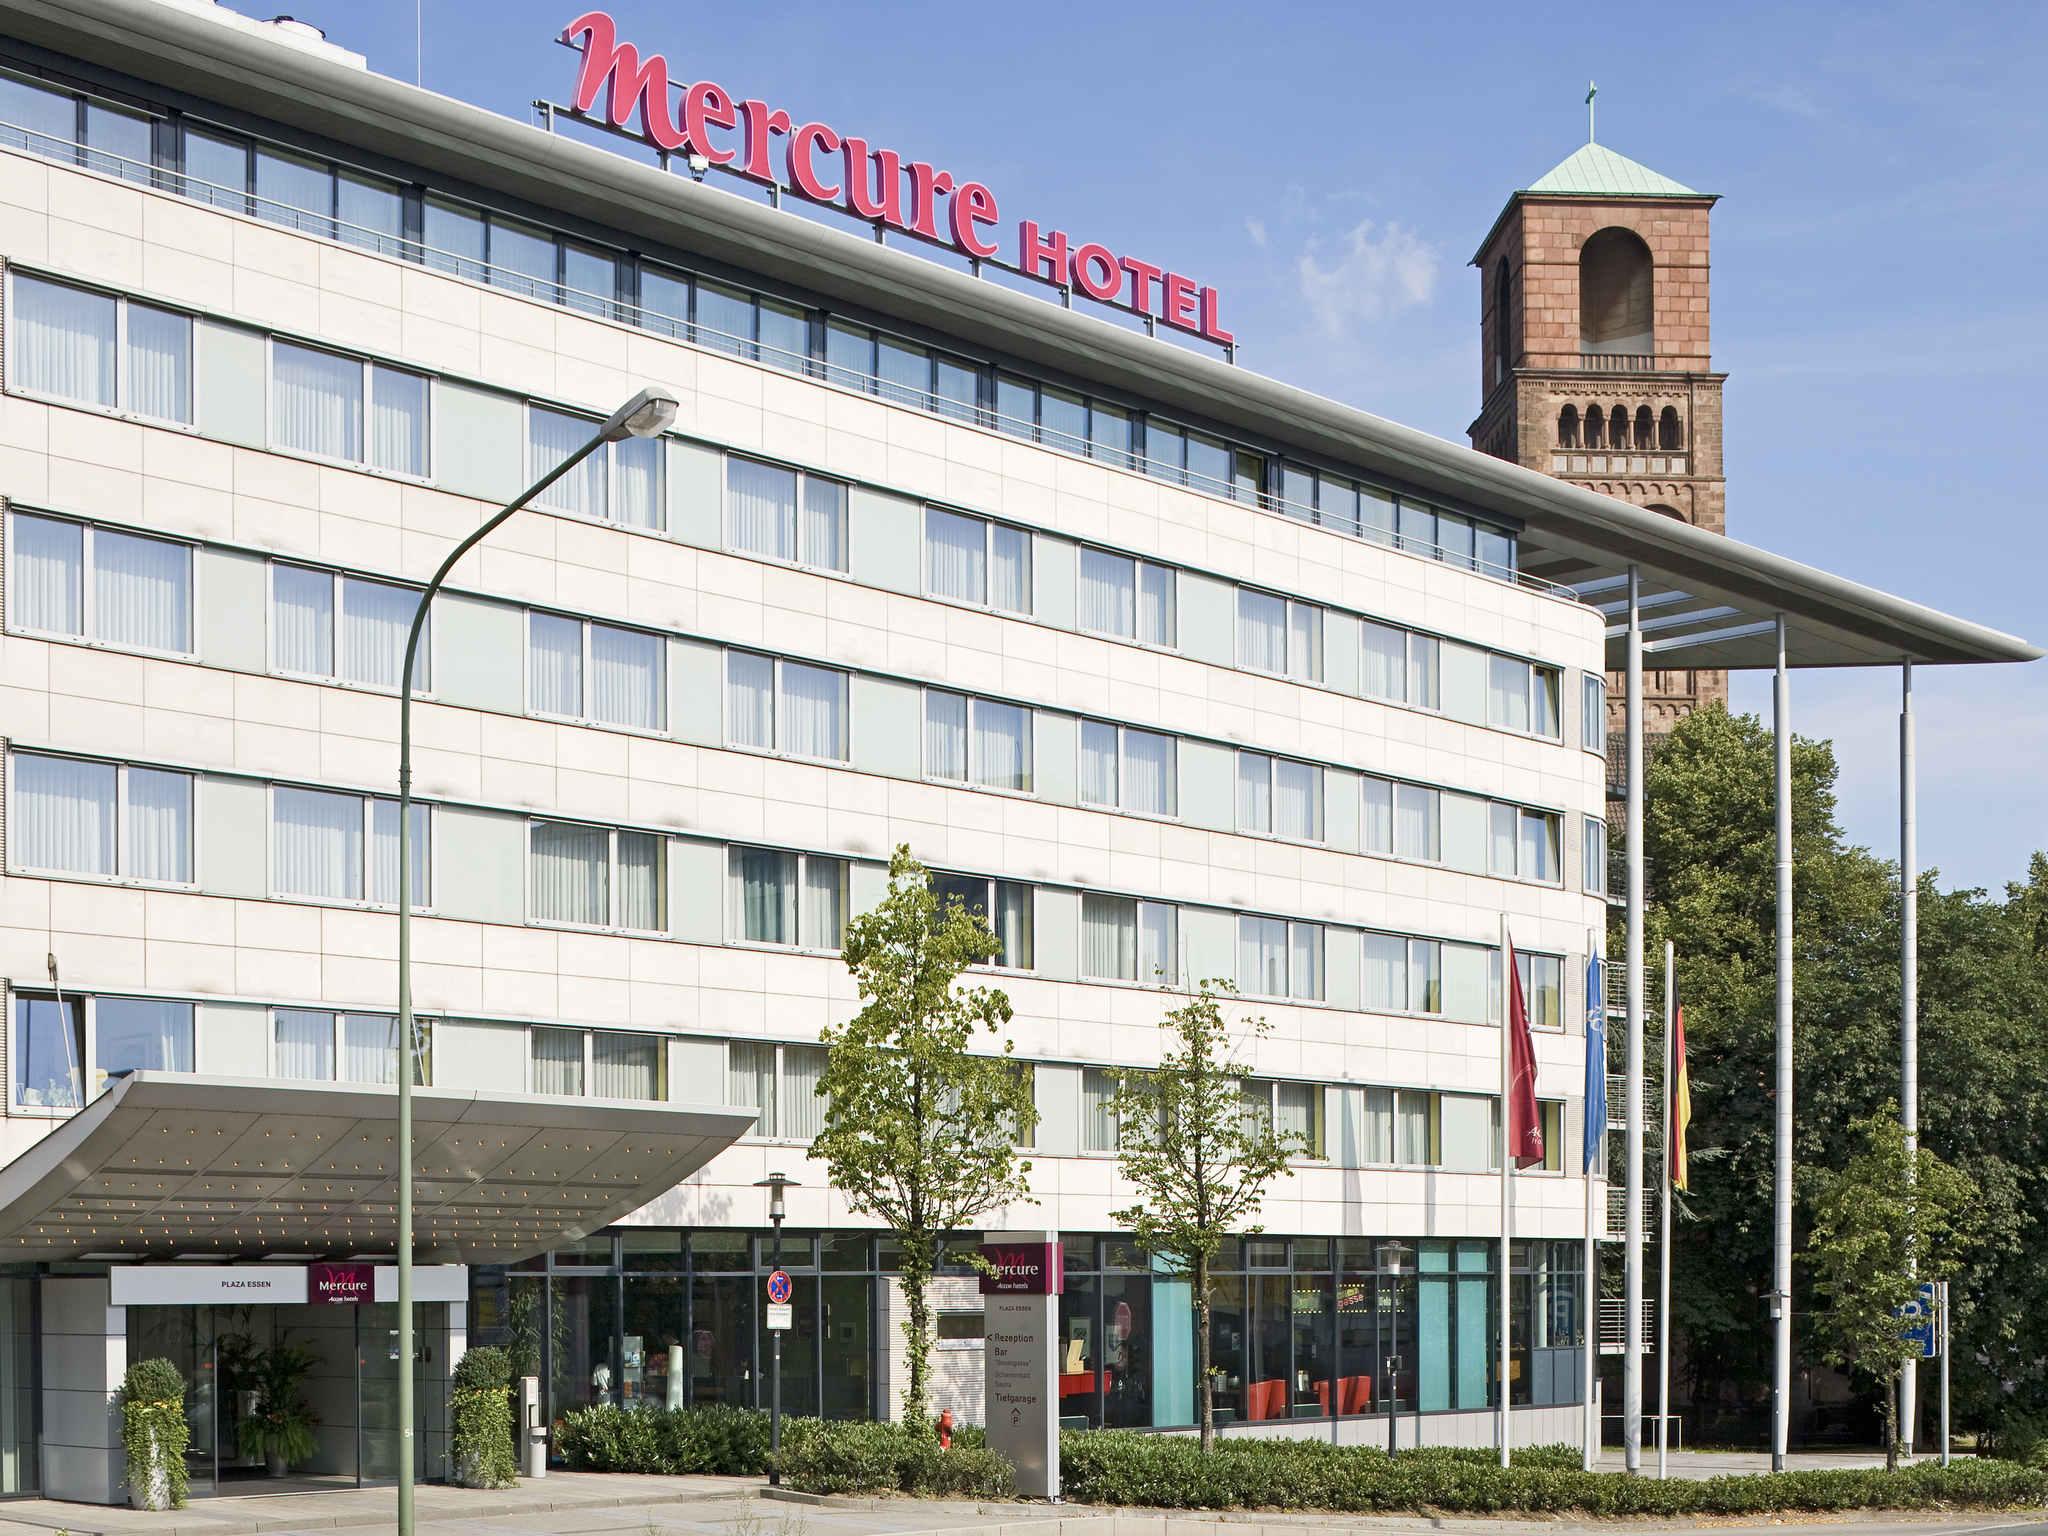 Mercure Hotel Essen Booking